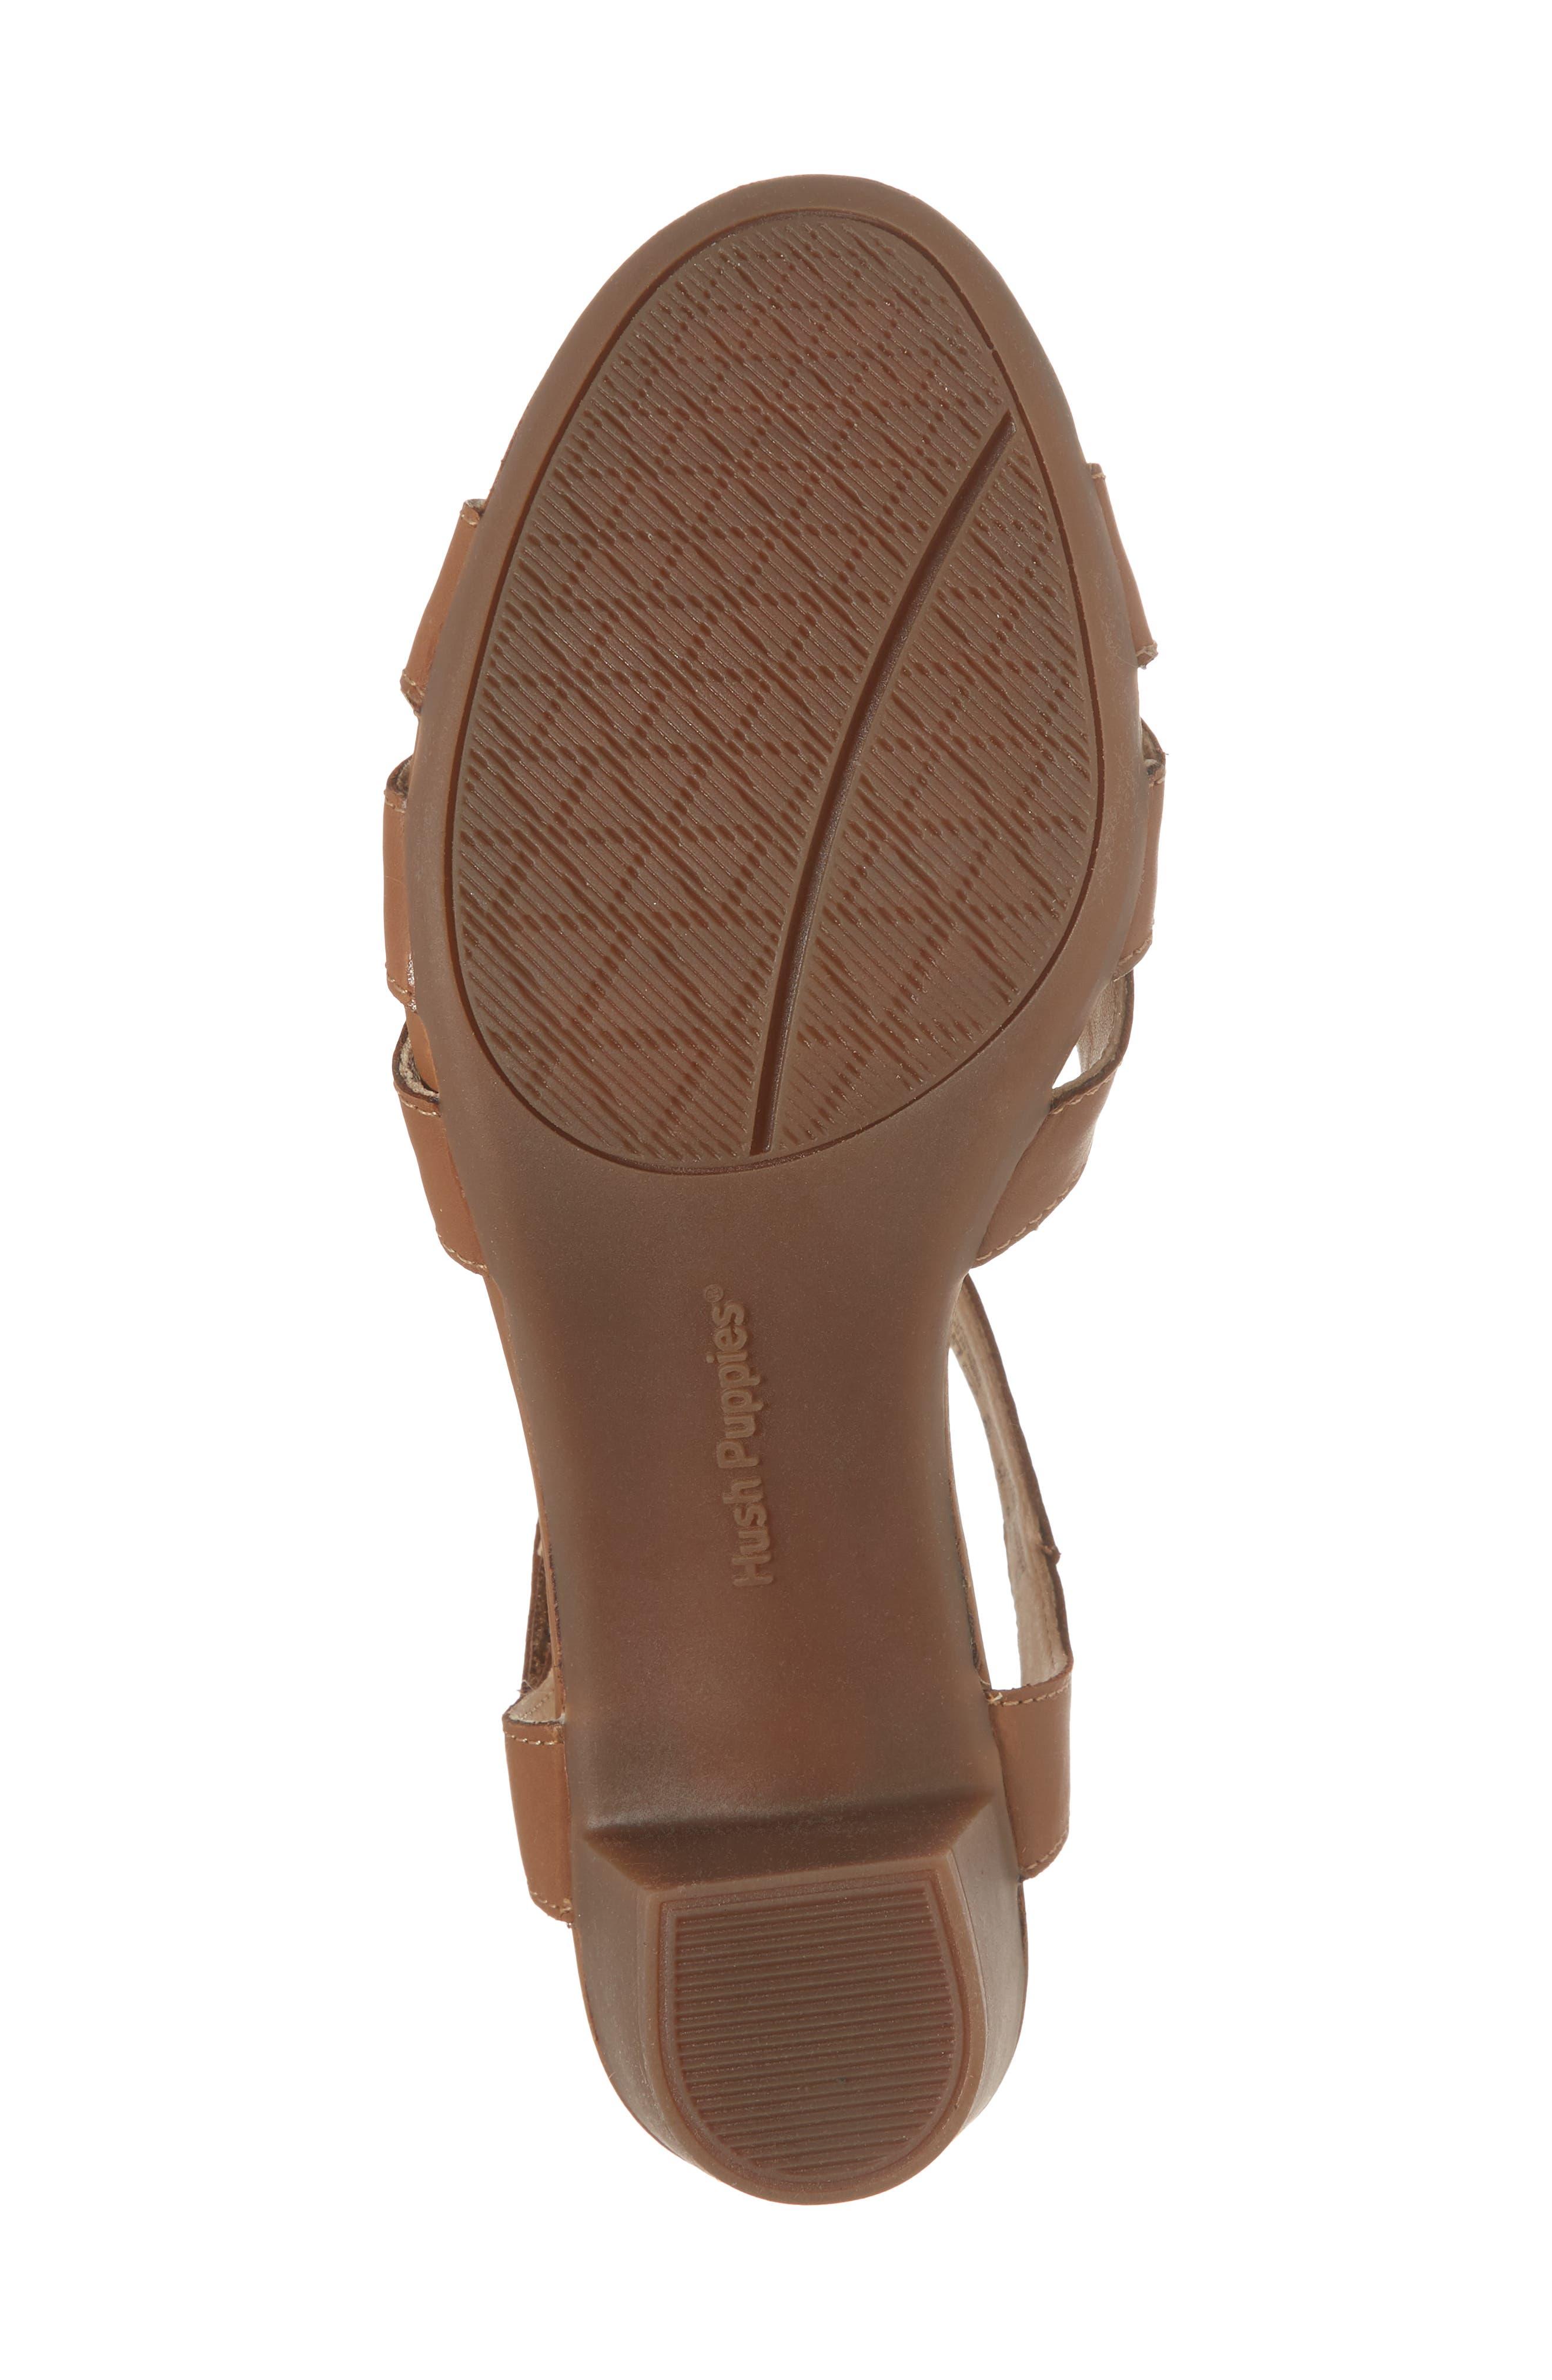 Masseter Quarter Strap Sandal,                             Alternate thumbnail 6, color,                             Tan Leather